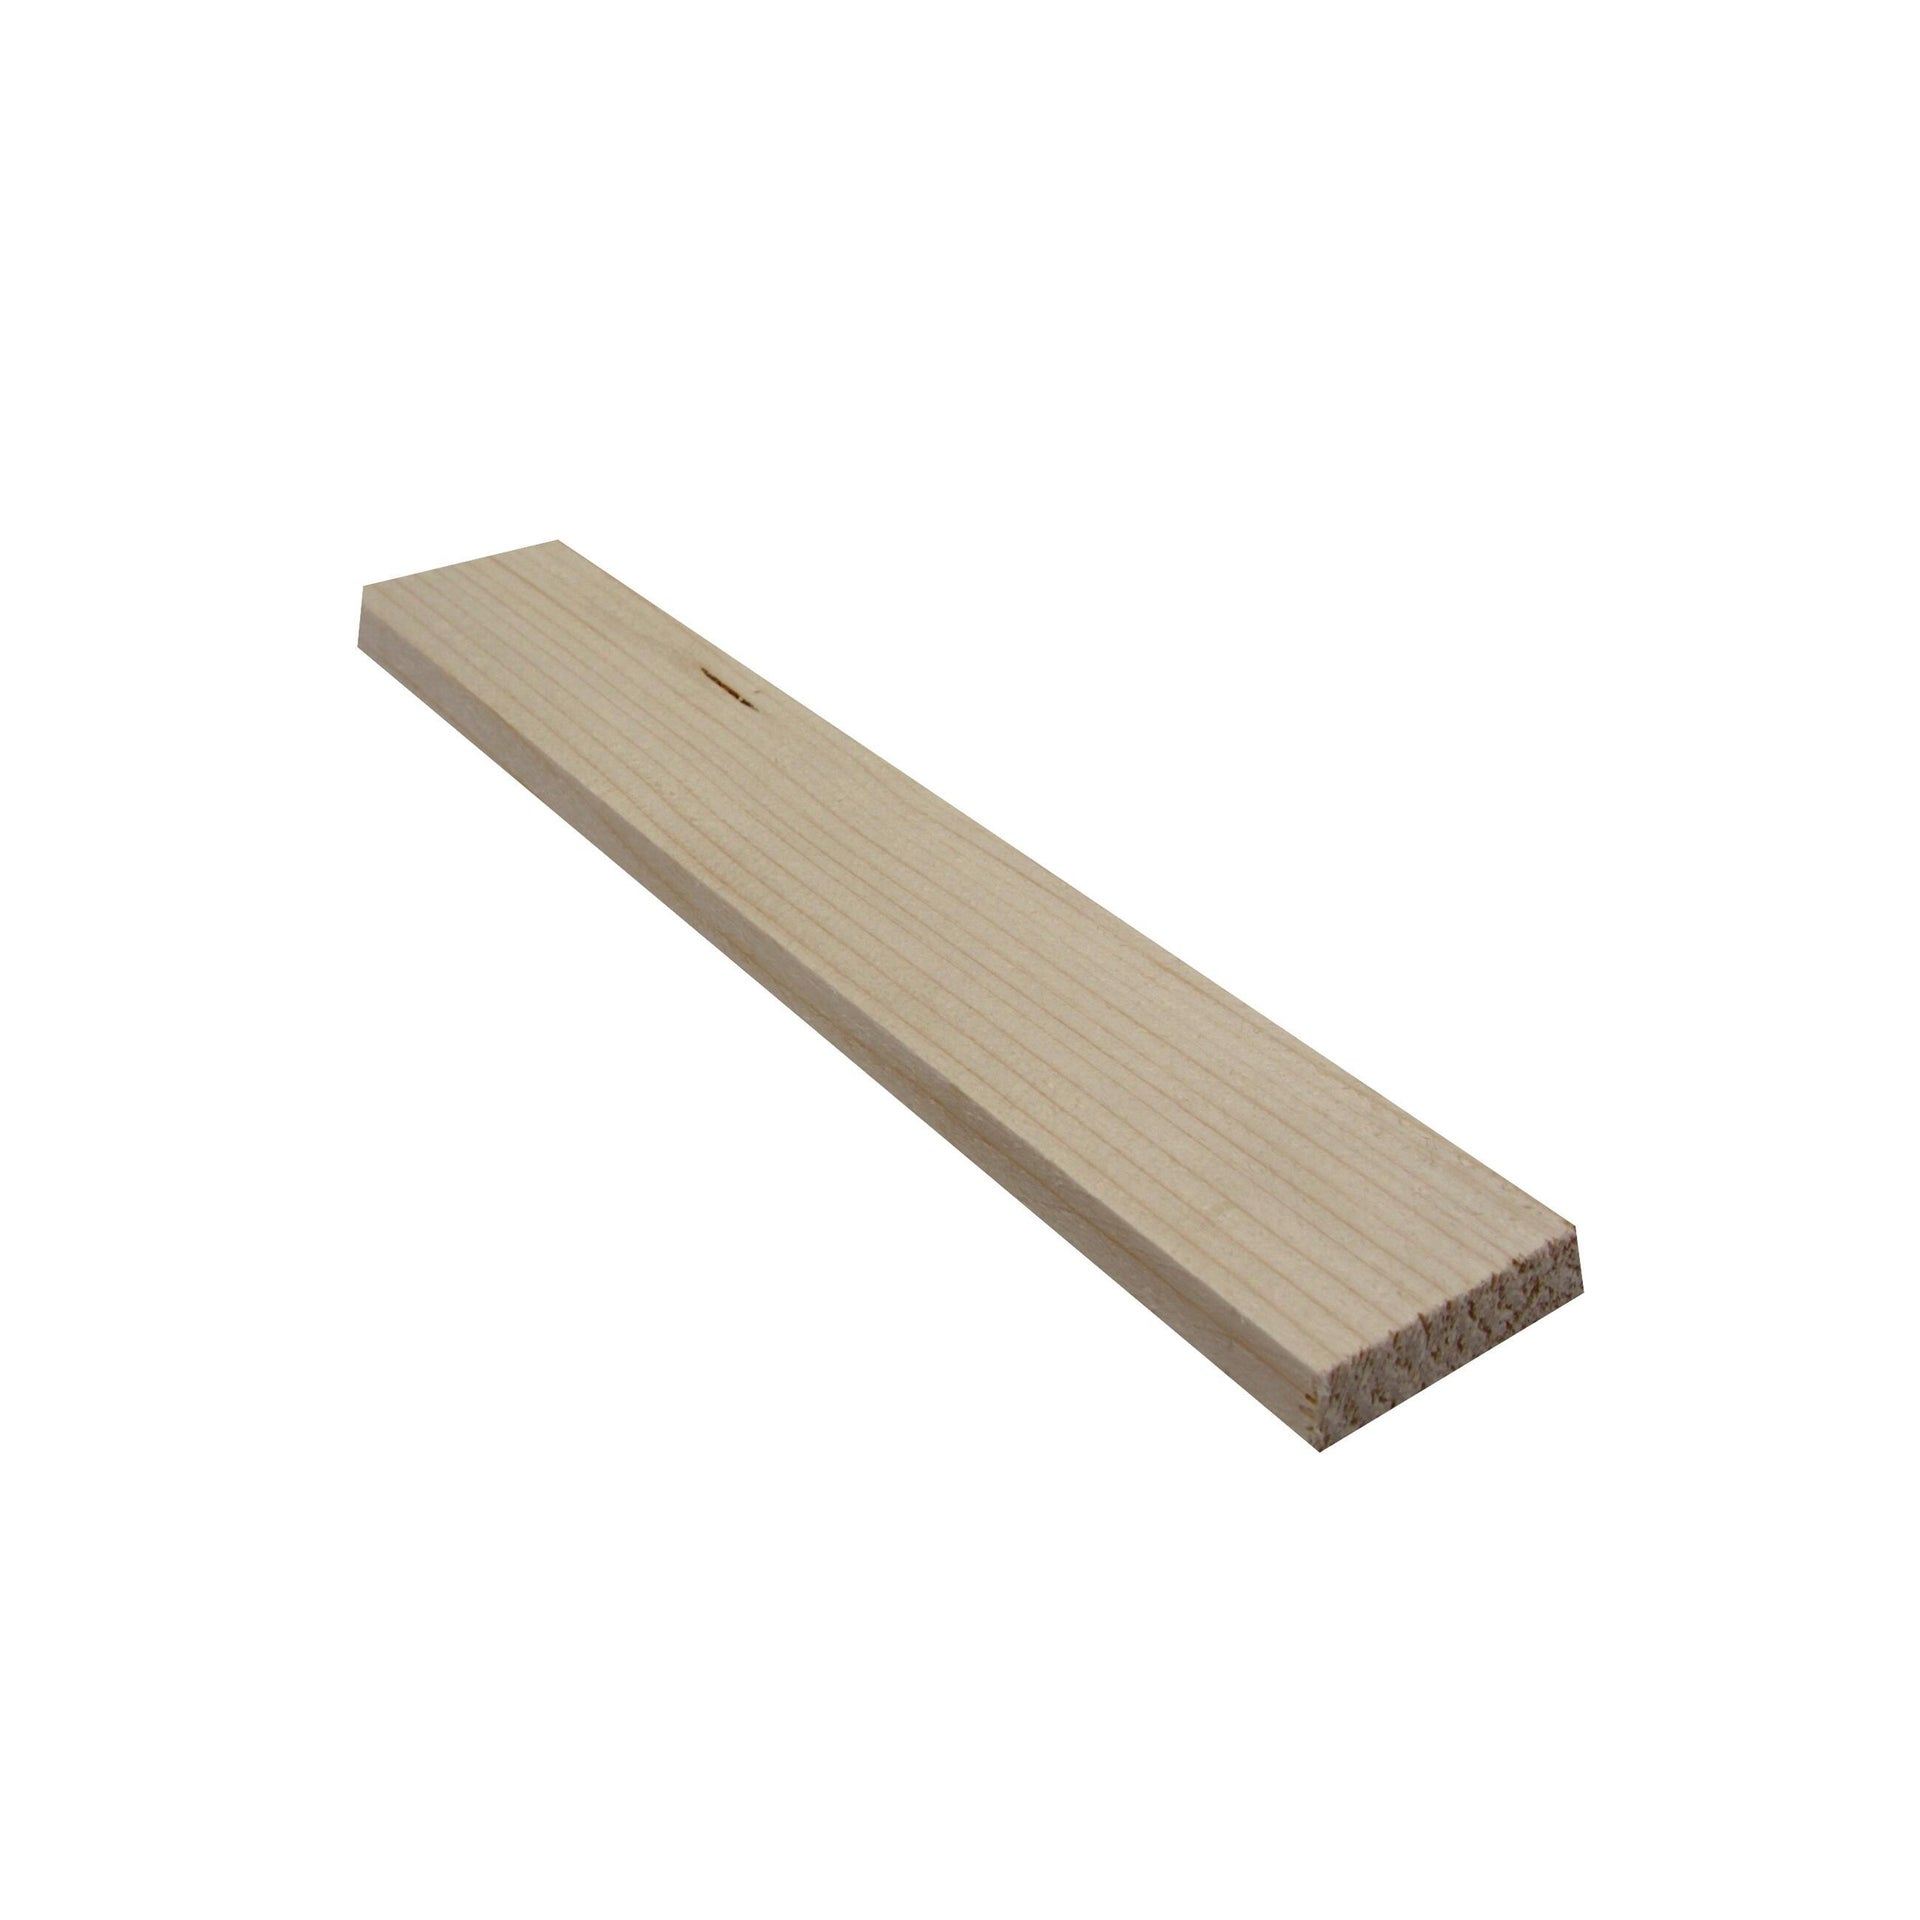 Listello grezzo abete 2 m x 40 mm, Sp 10 mm